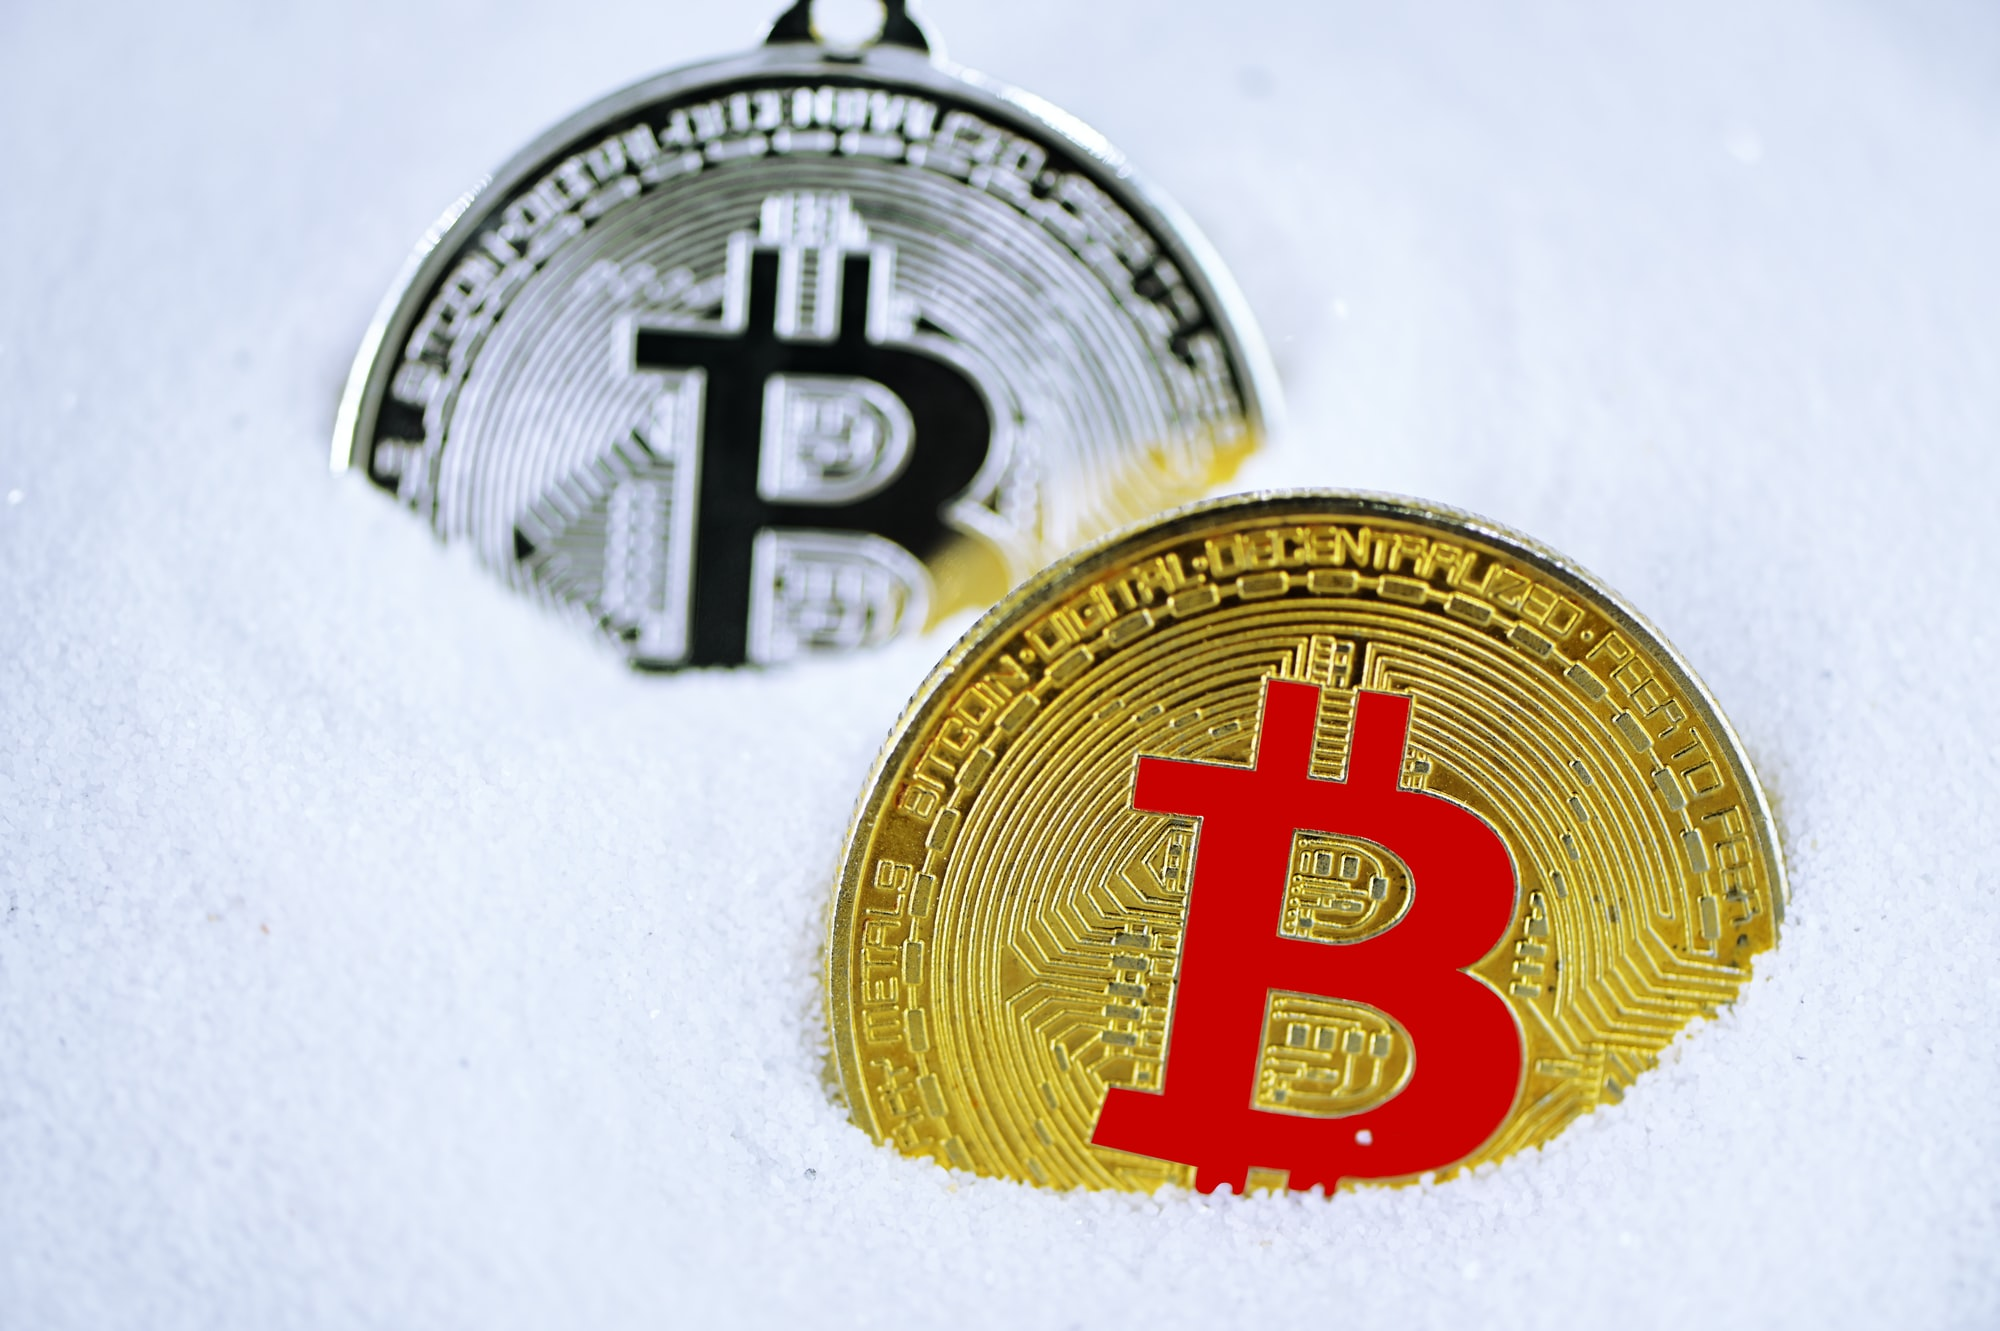 Bitcoin ต้องรักษาระดับเหนือ $52K ให้ได้!